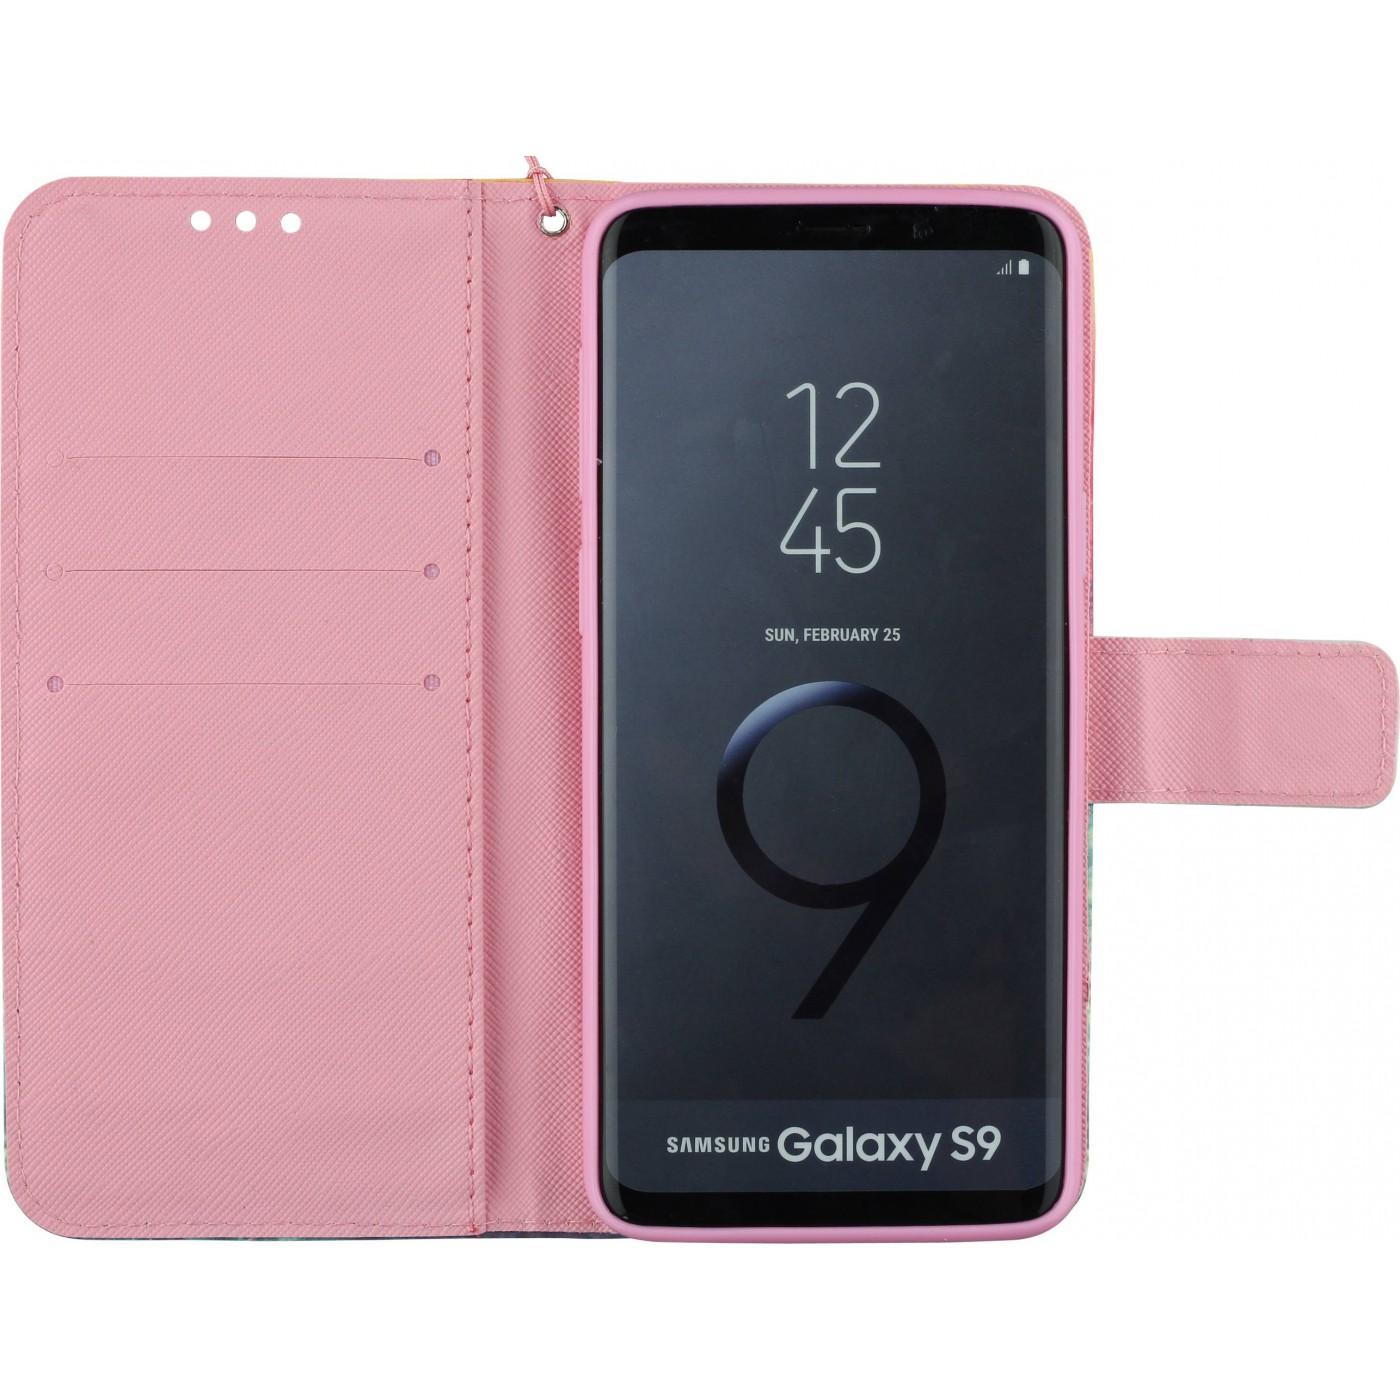 Samsung galaxy s9 3d ansicht